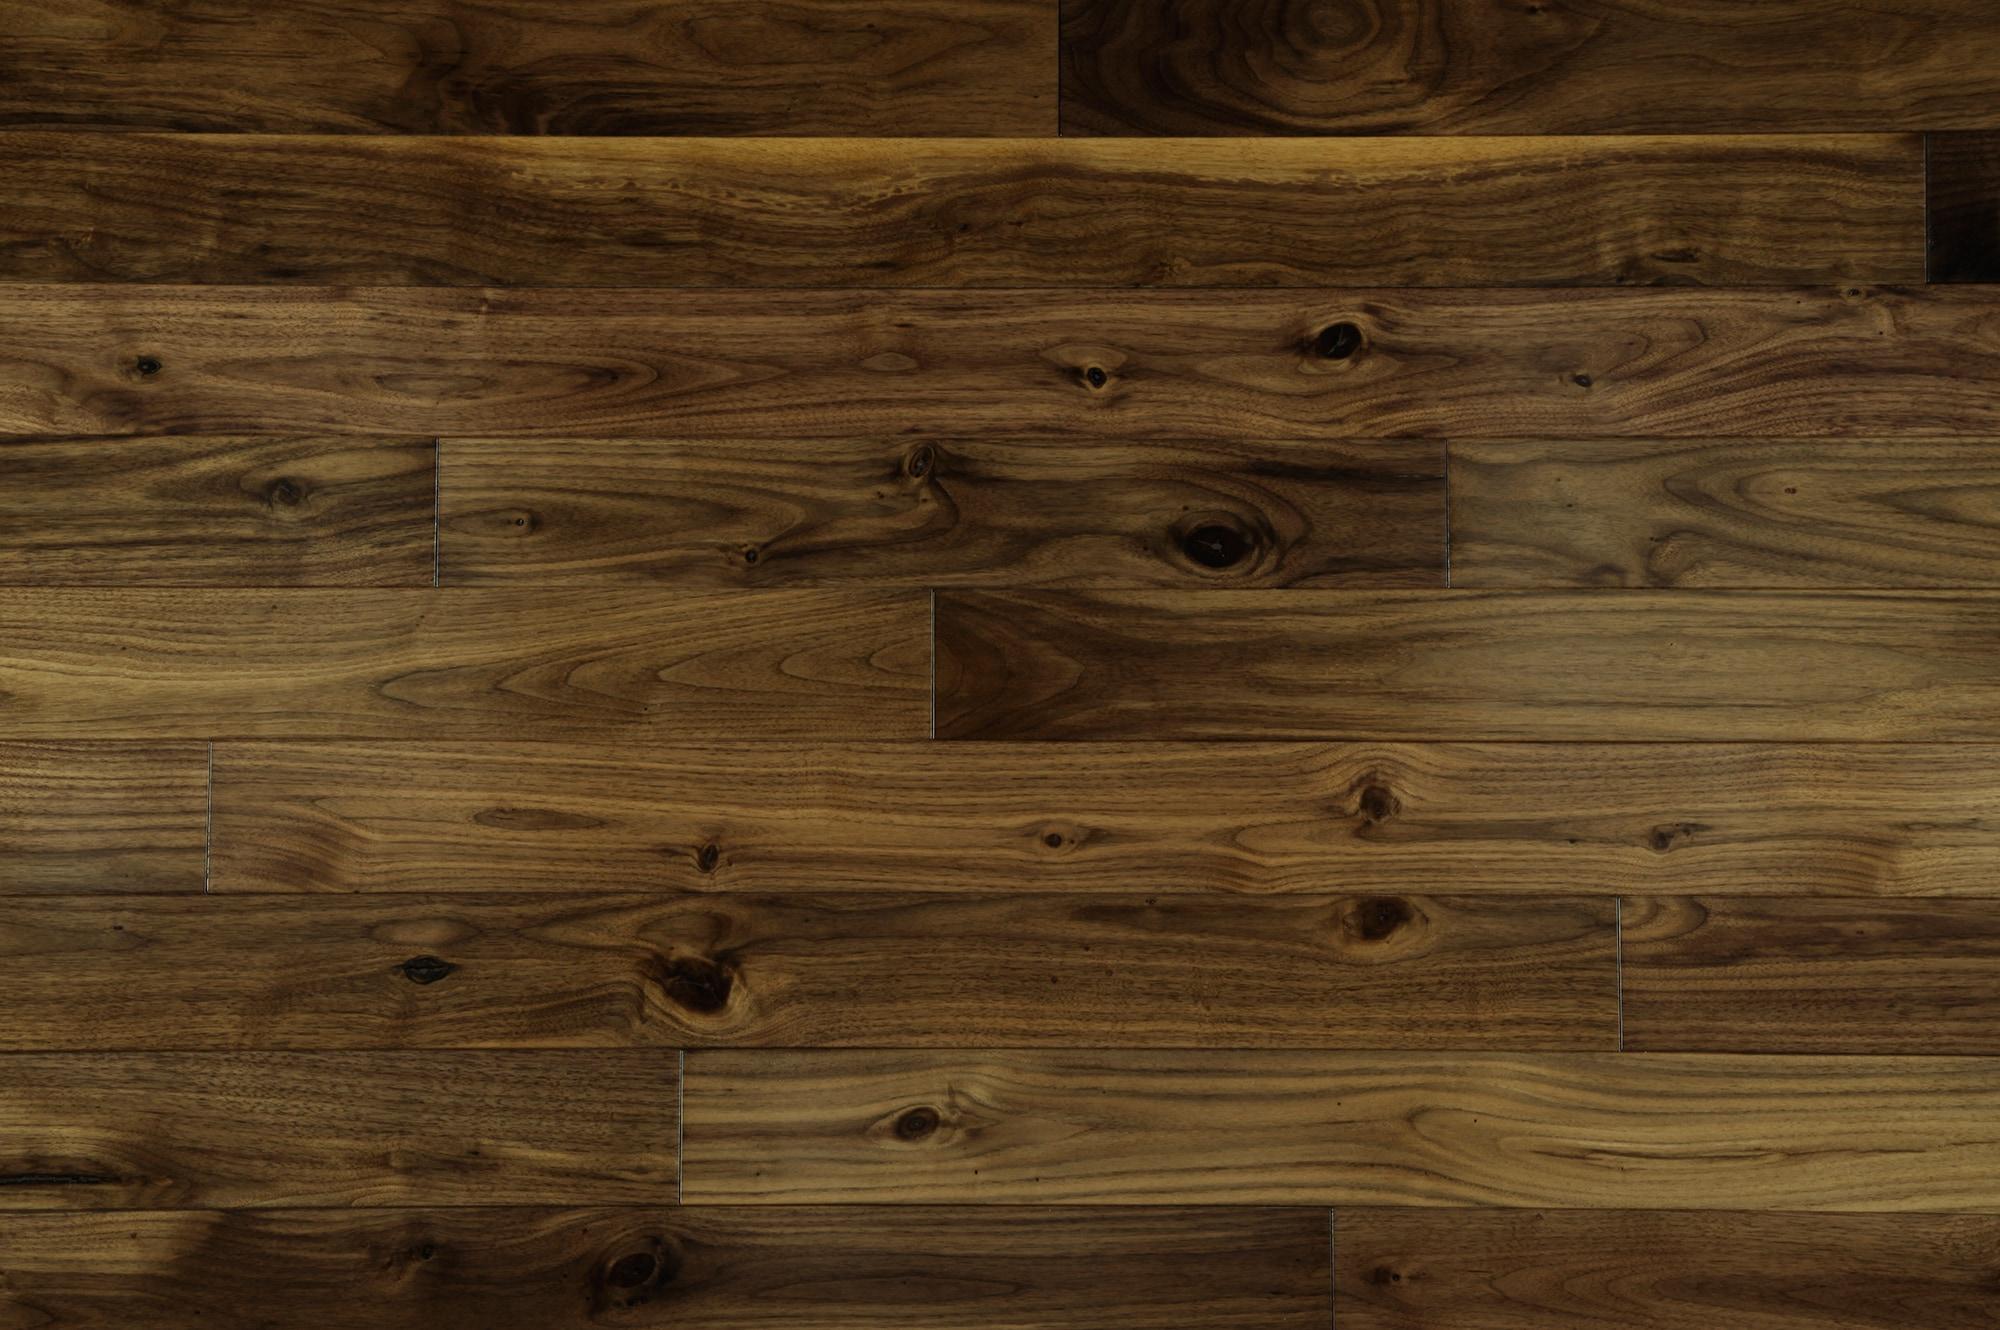 Black Walnut Hardwood Flooring black walnut Jasper Hardwood Prefinished American Black Walnut Collection American Black Walnut Premiere 3 14